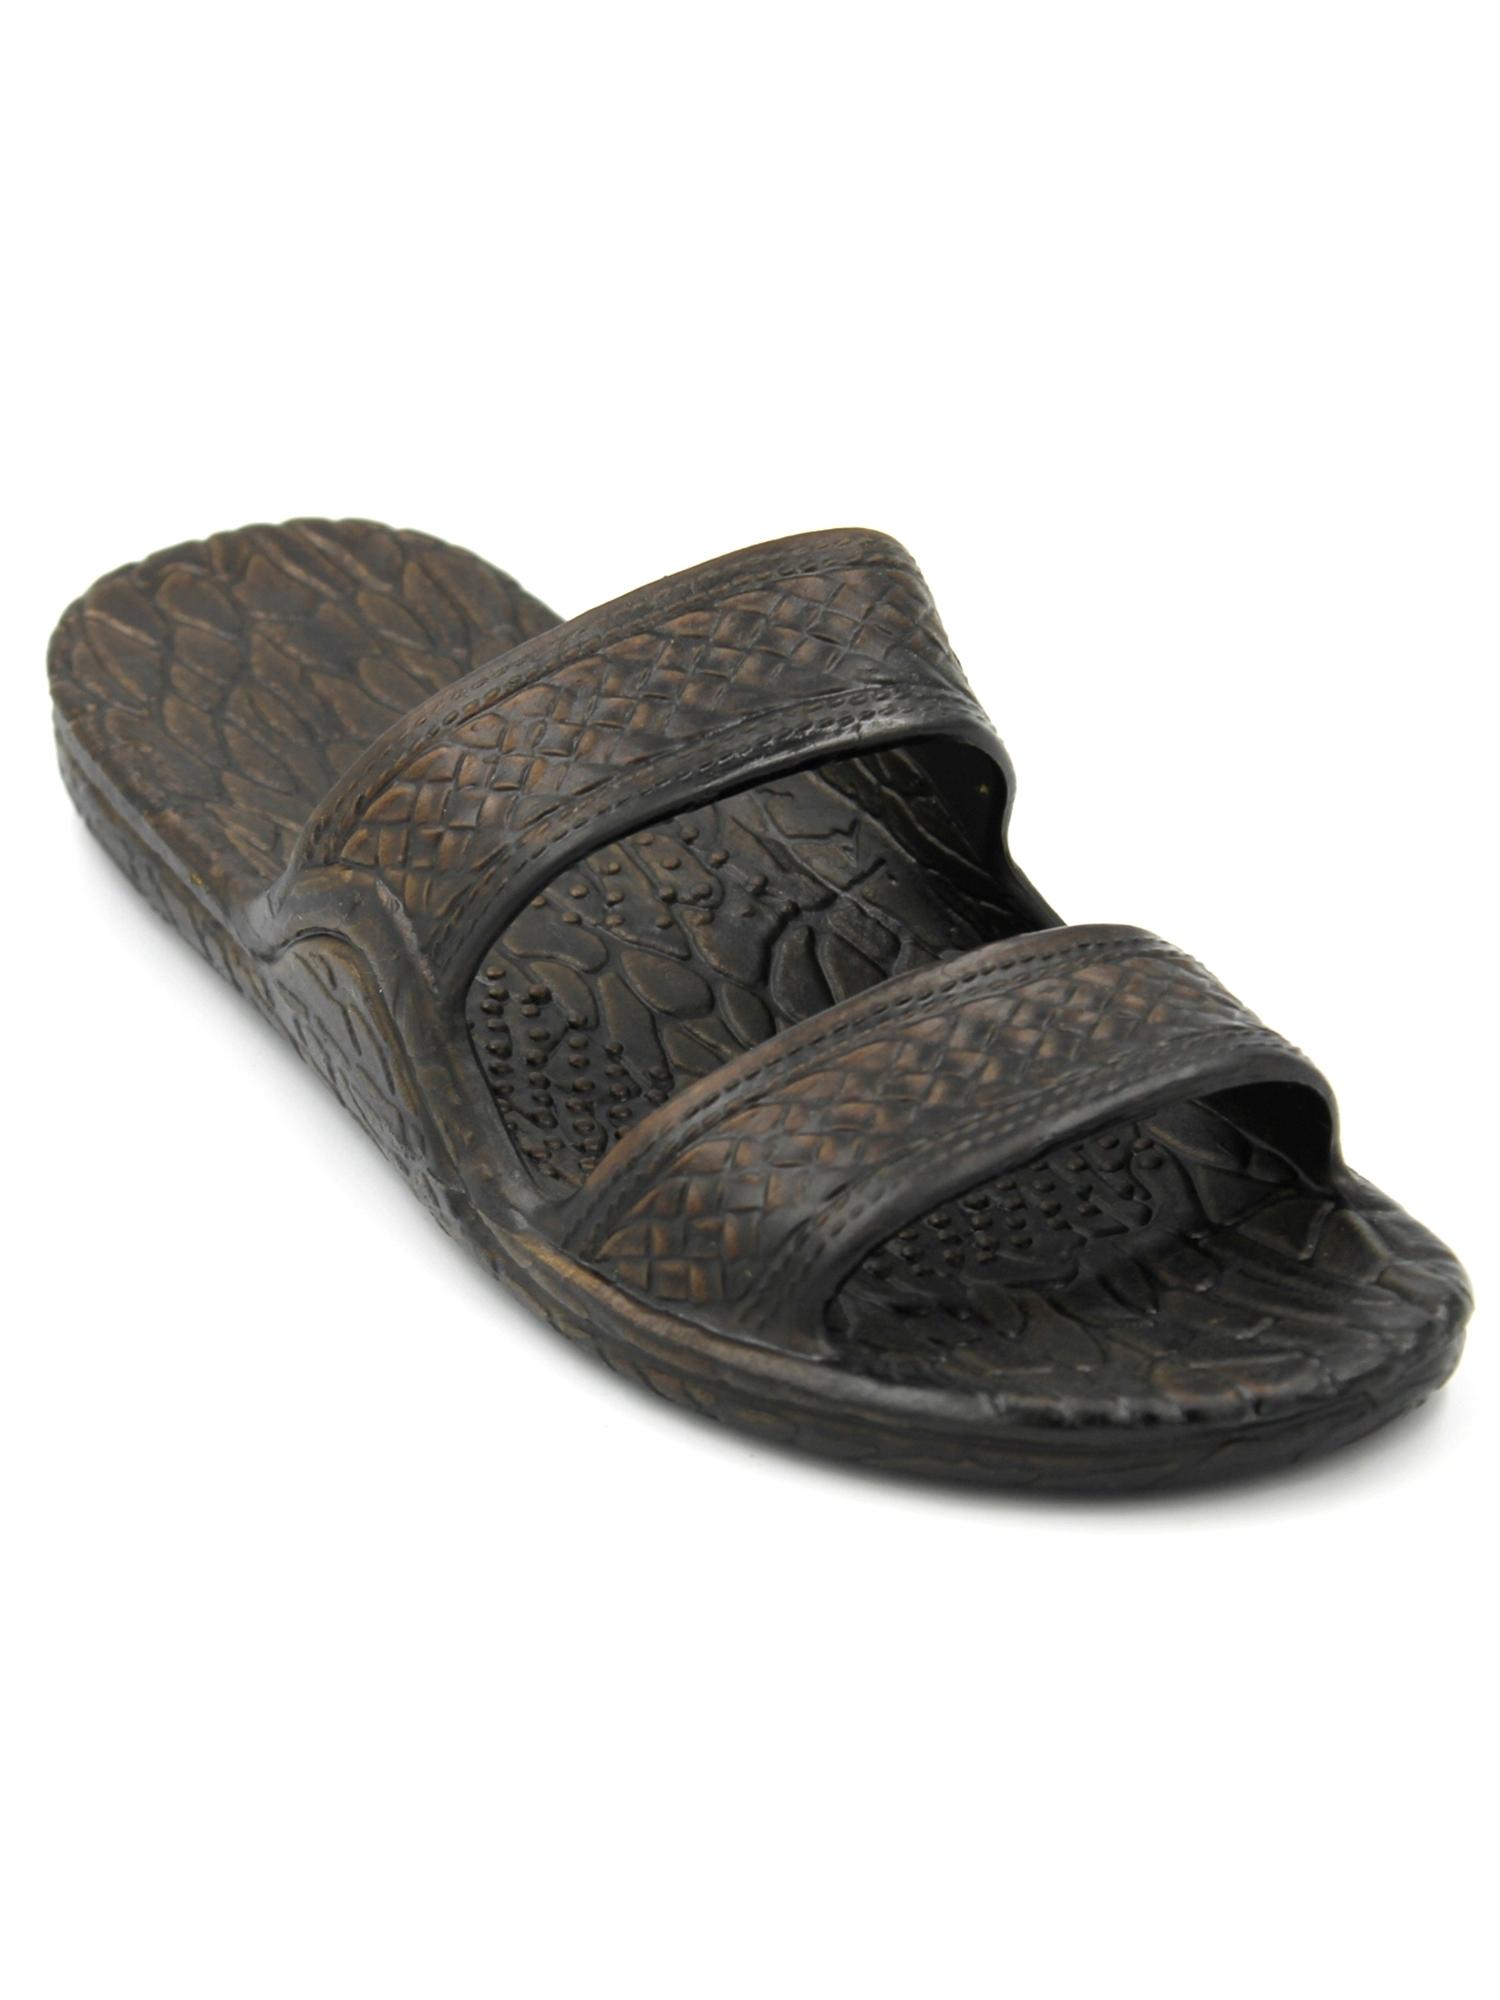 Genuine Original Jesus Jandal Sandal (Dark Brown;Size 7)